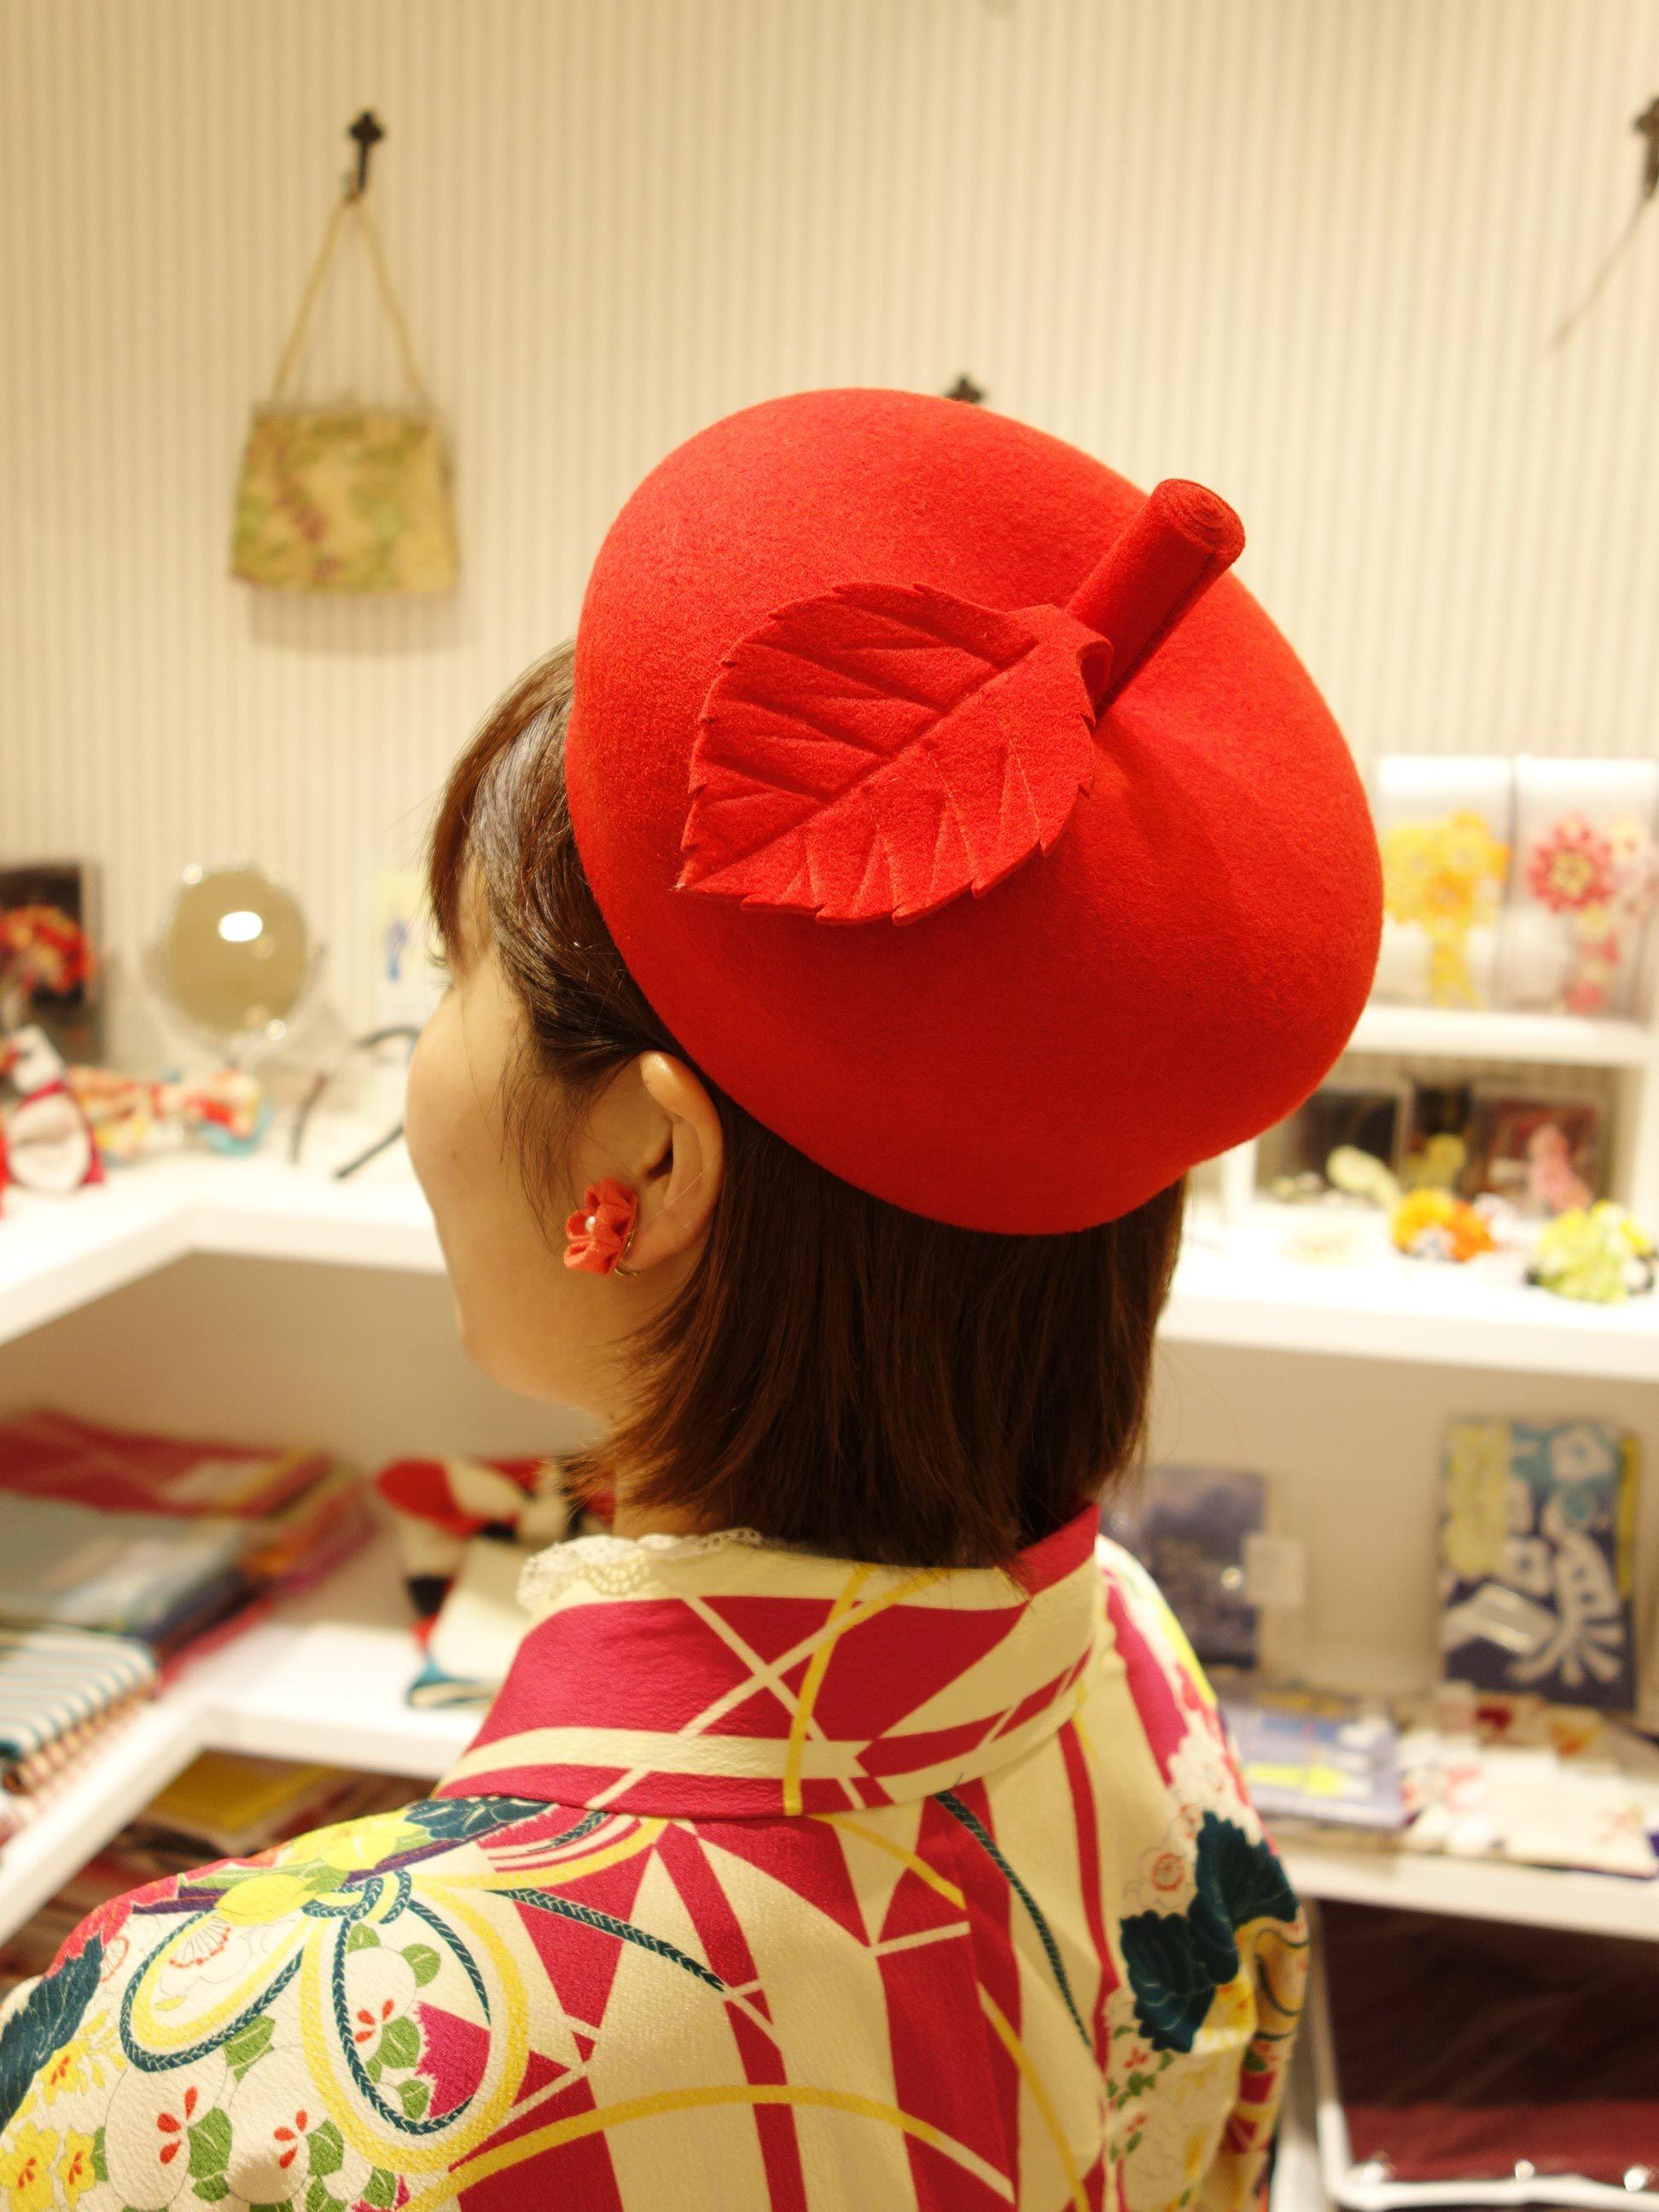 Chapon新作帽子*入荷しました*_e0167832_17585260.jpg